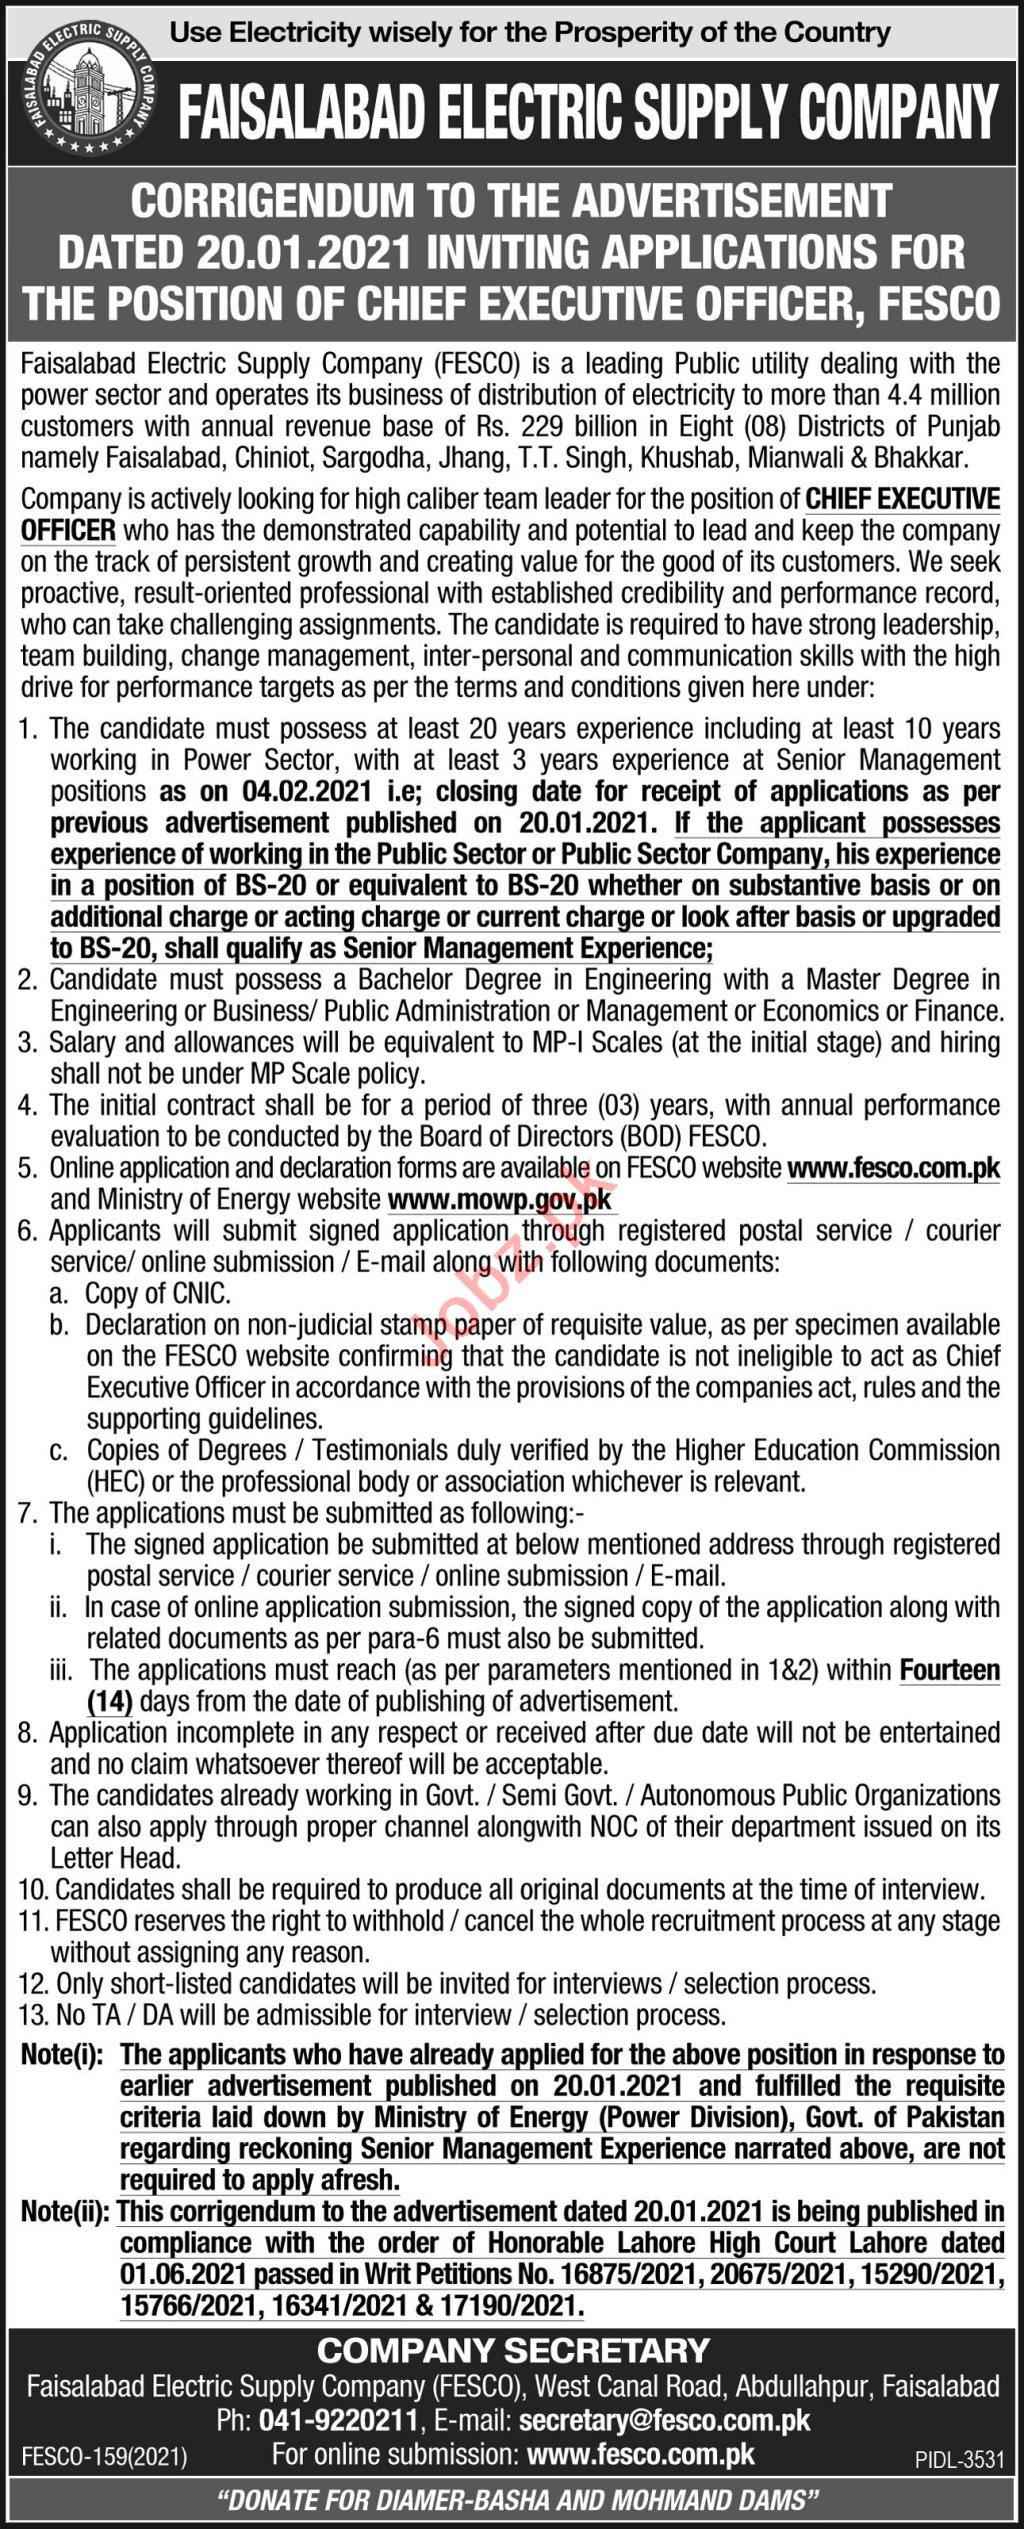 CEO Jobs 2021 in Faisalabad Electric Supply Company FESCO